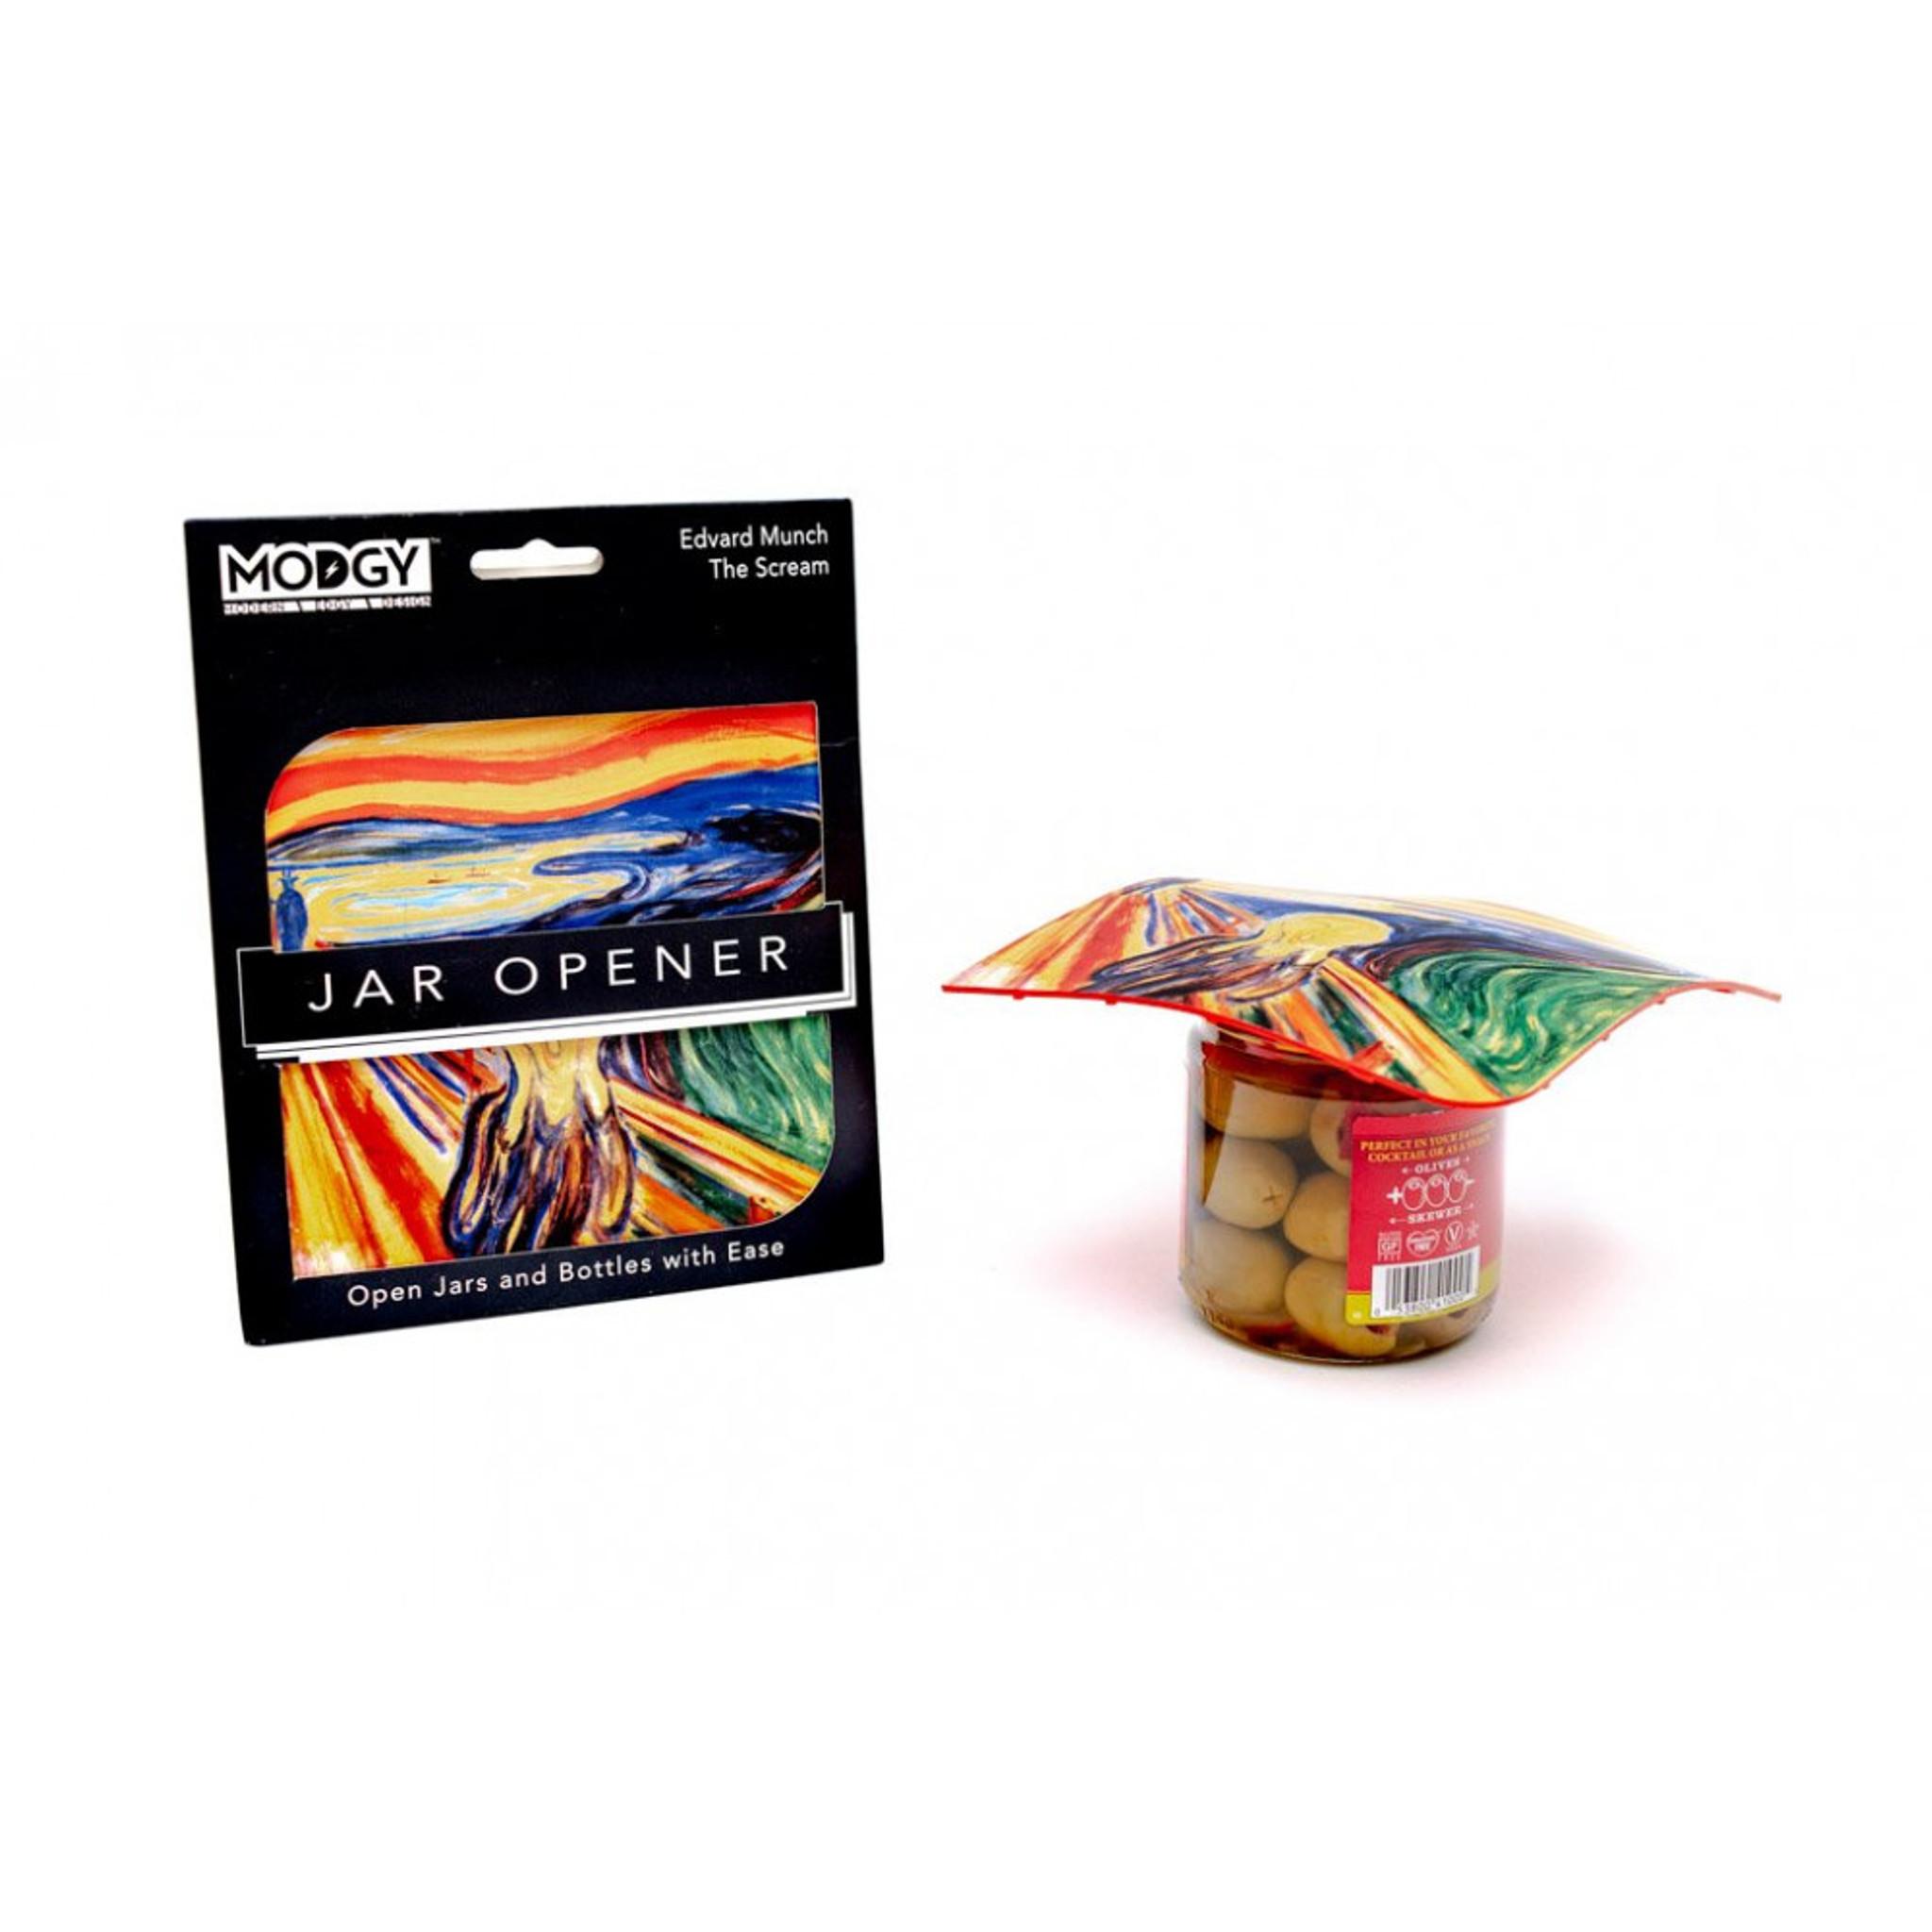 Jar Opener - The Scream